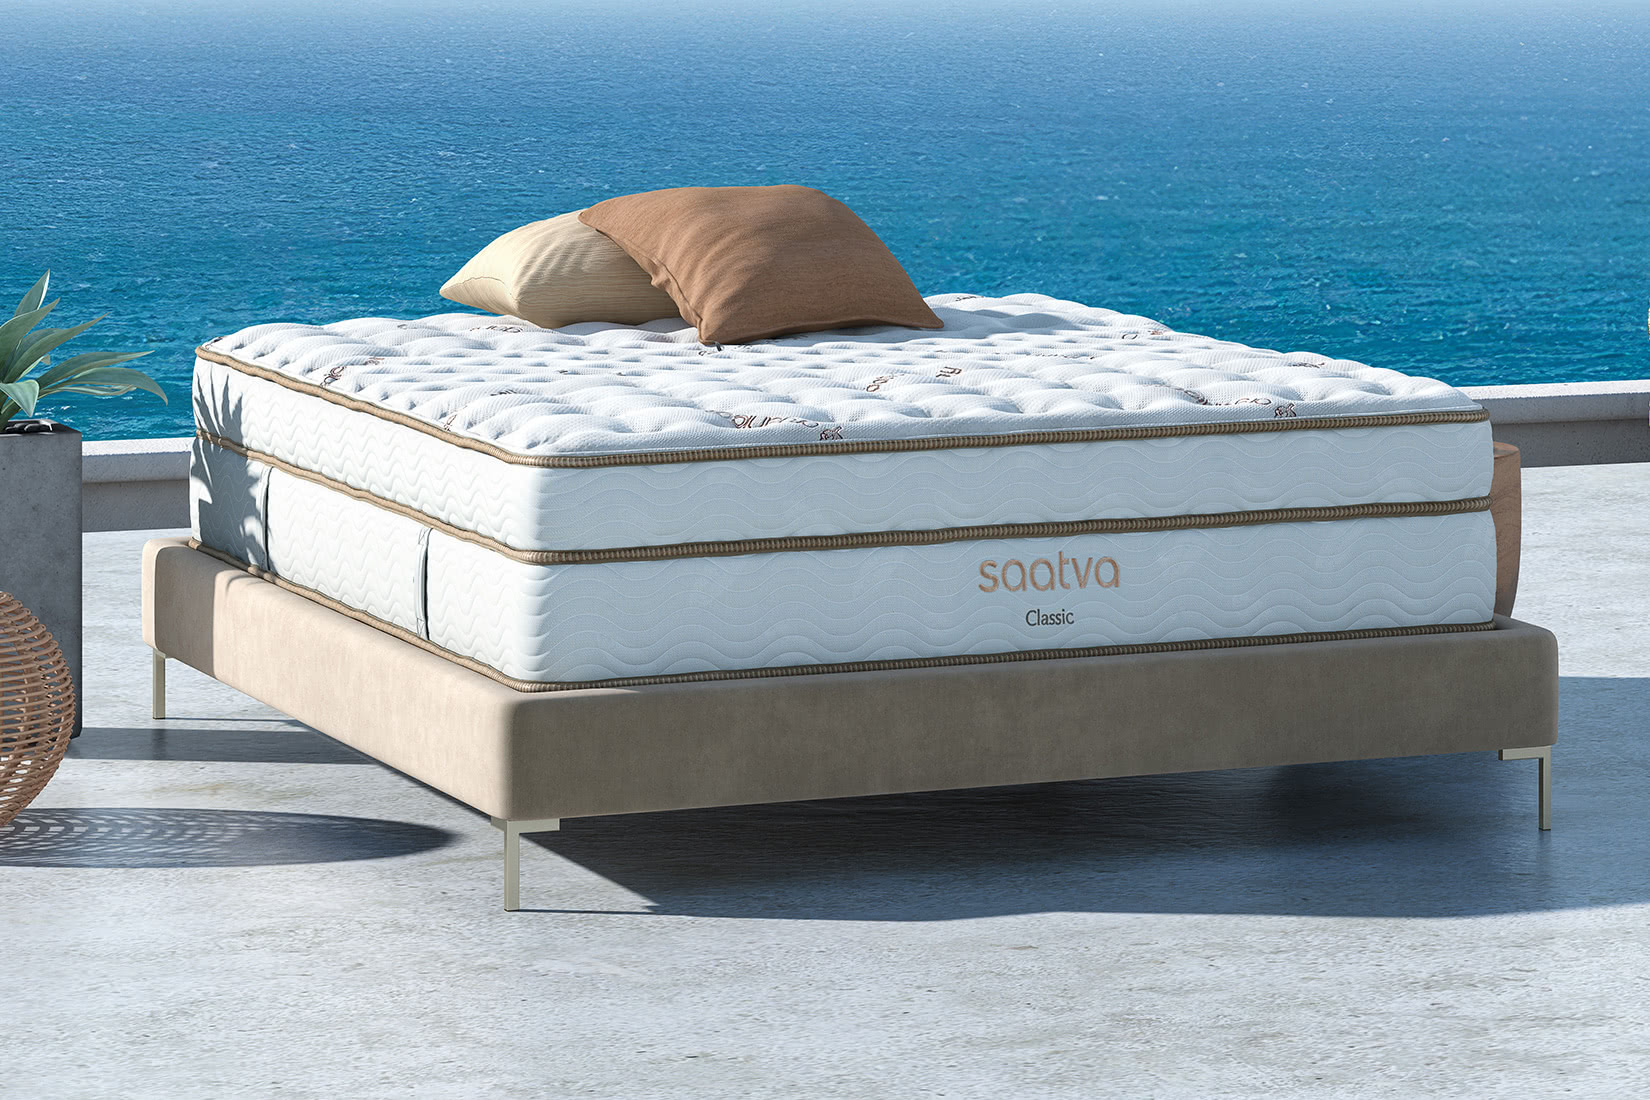 Saatva classic luxury mattress review - Luxe Digital